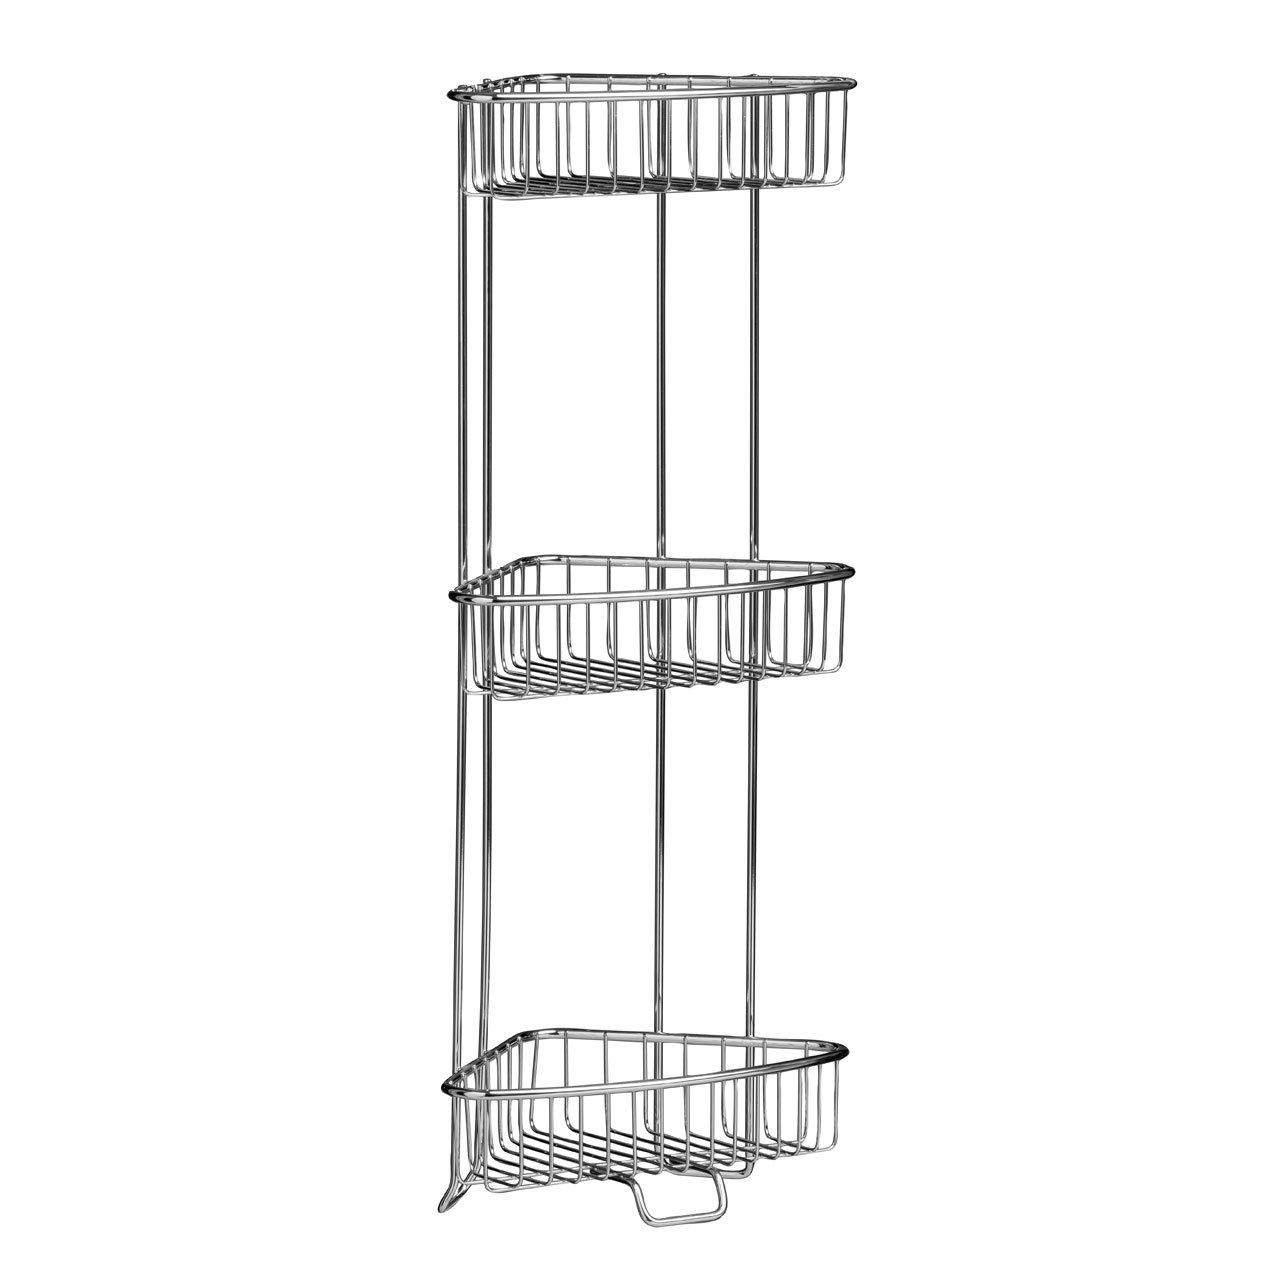 Bathroom Corner Shelf Storage Unit With 3 Tiers | Corner Shower ...